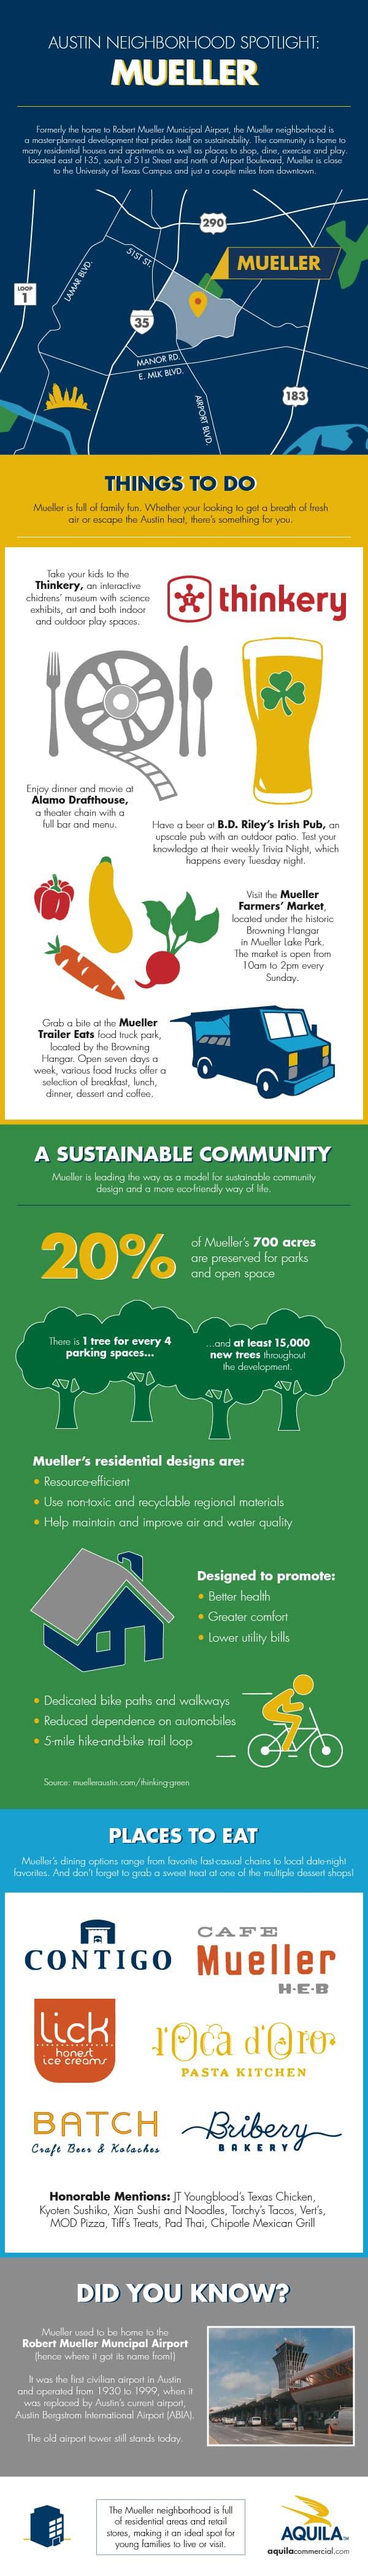 Mueller Austin Neighborhood Spotlight Infographic - AQUILA